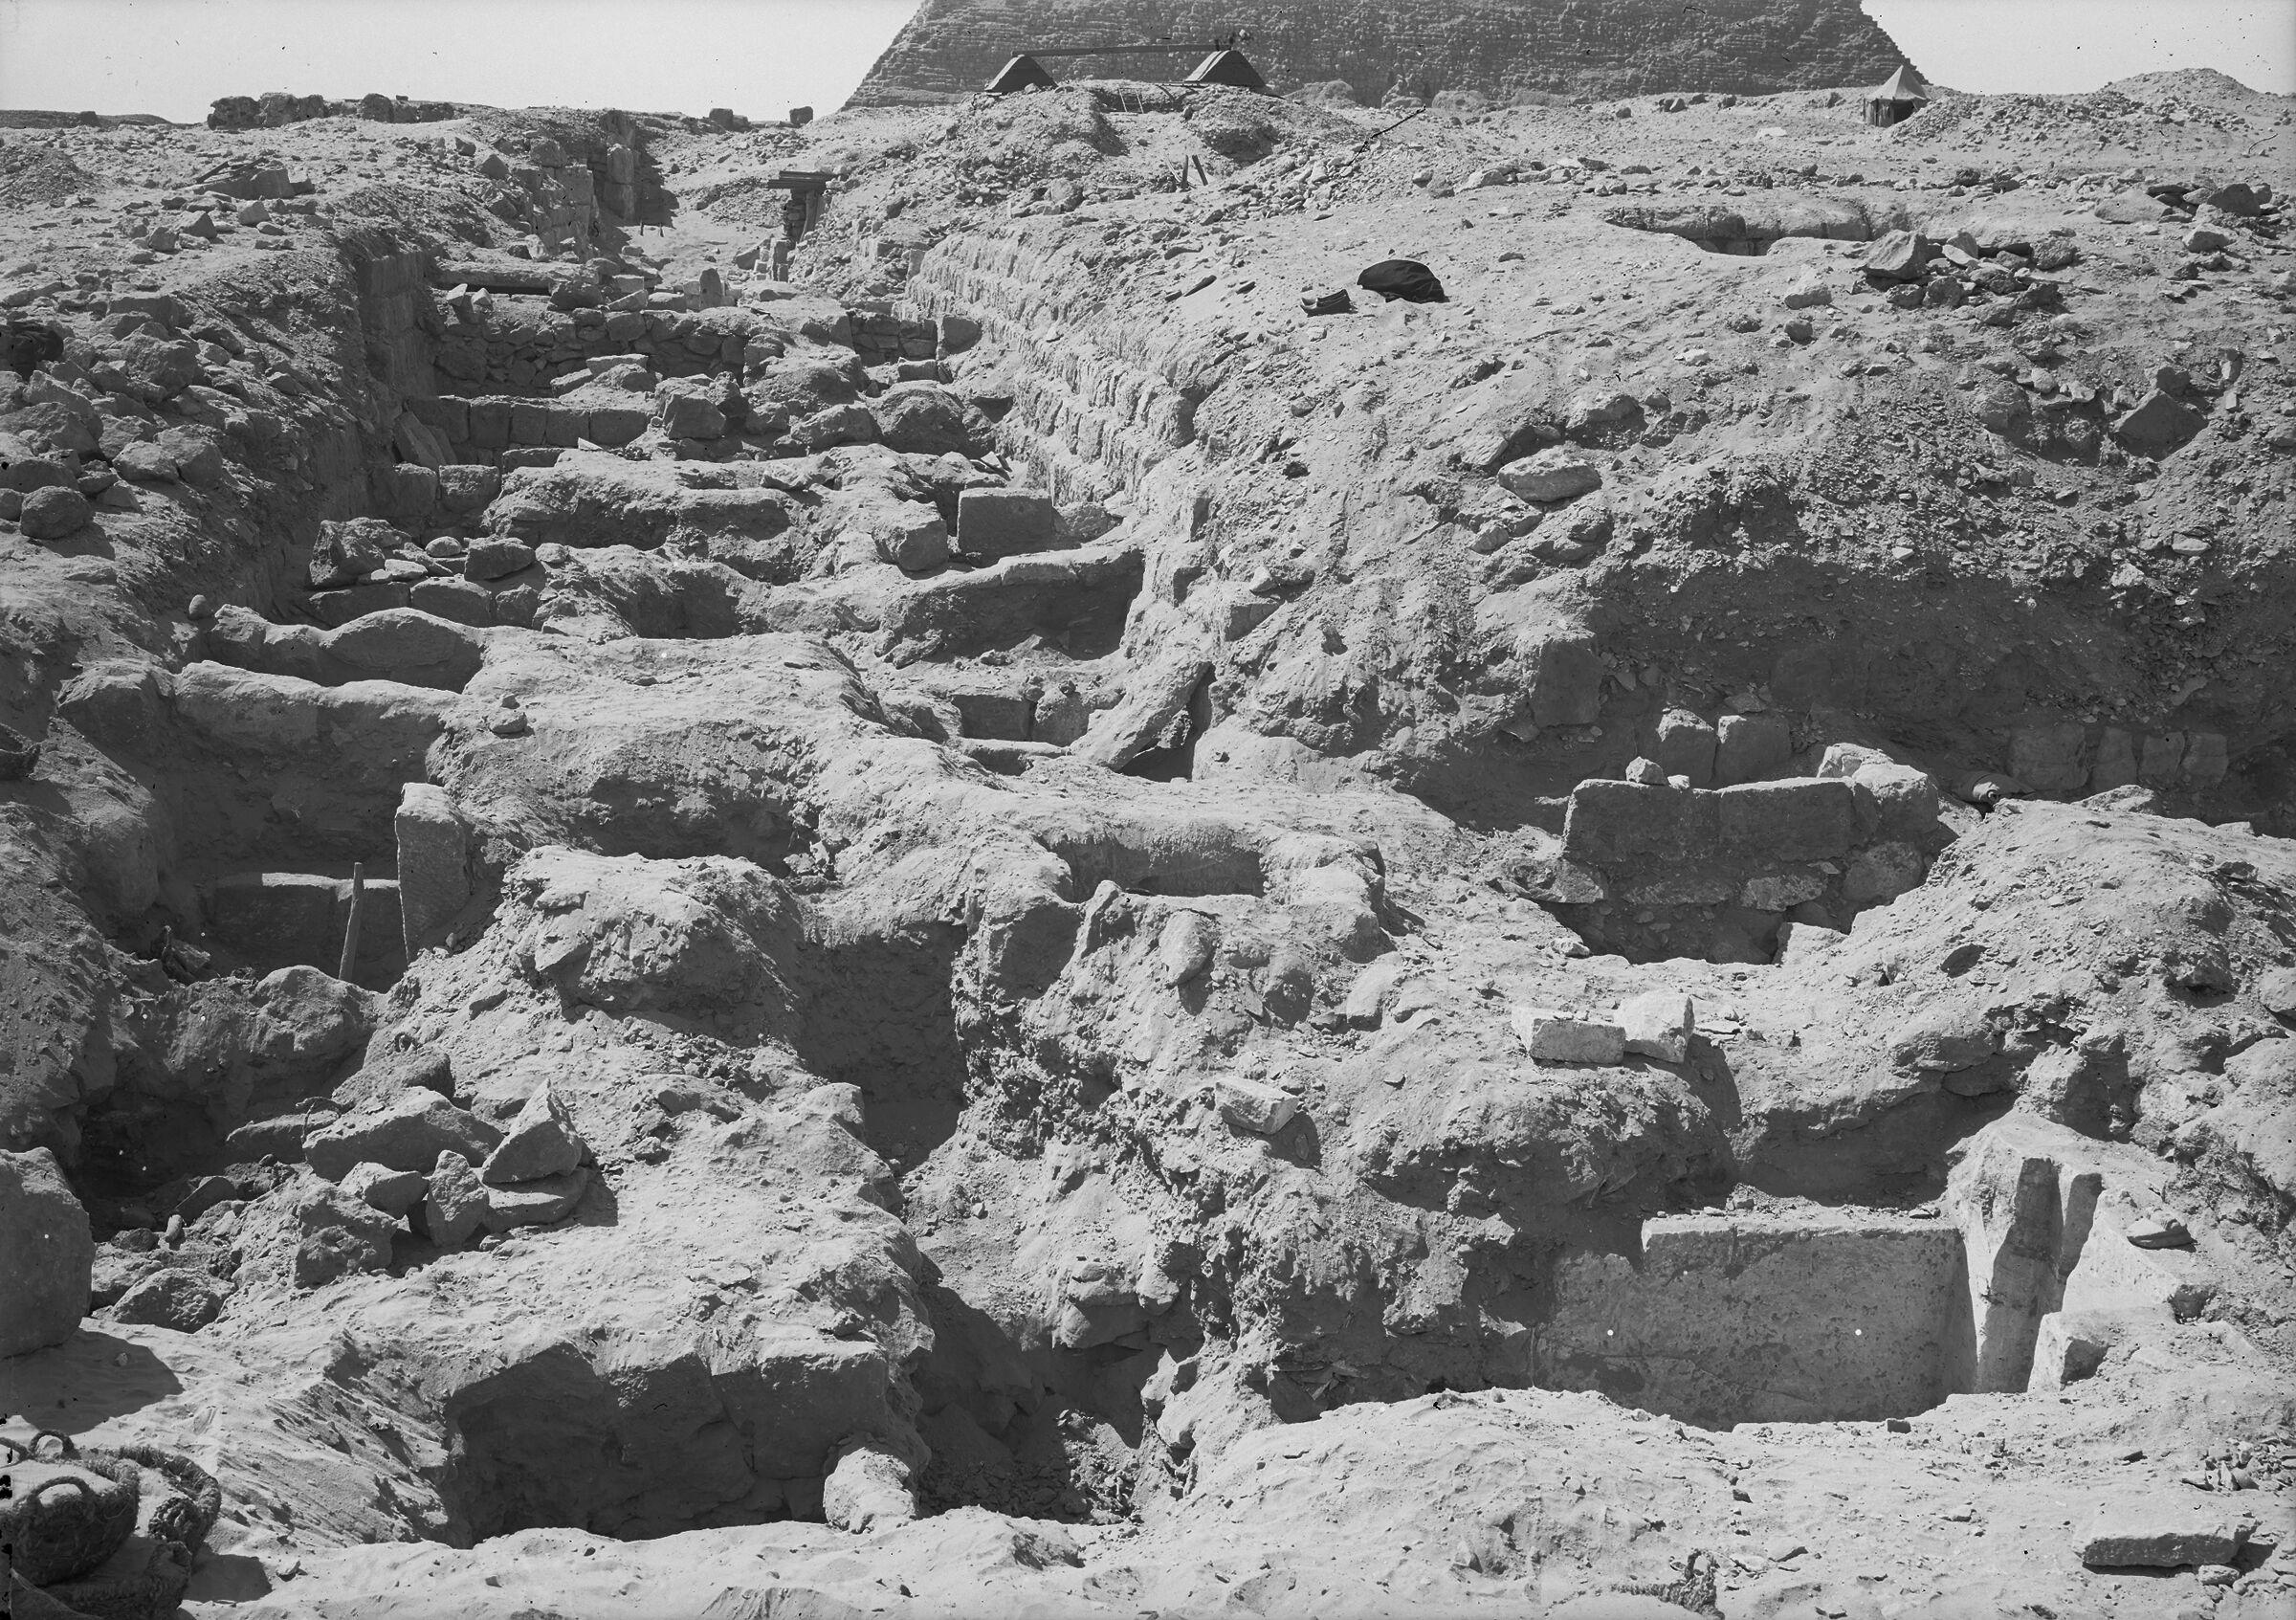 Western Cemetery: Site: Giza; View: G 2190 = G 5090, G 2194, G 2193, G 2192, G 2191